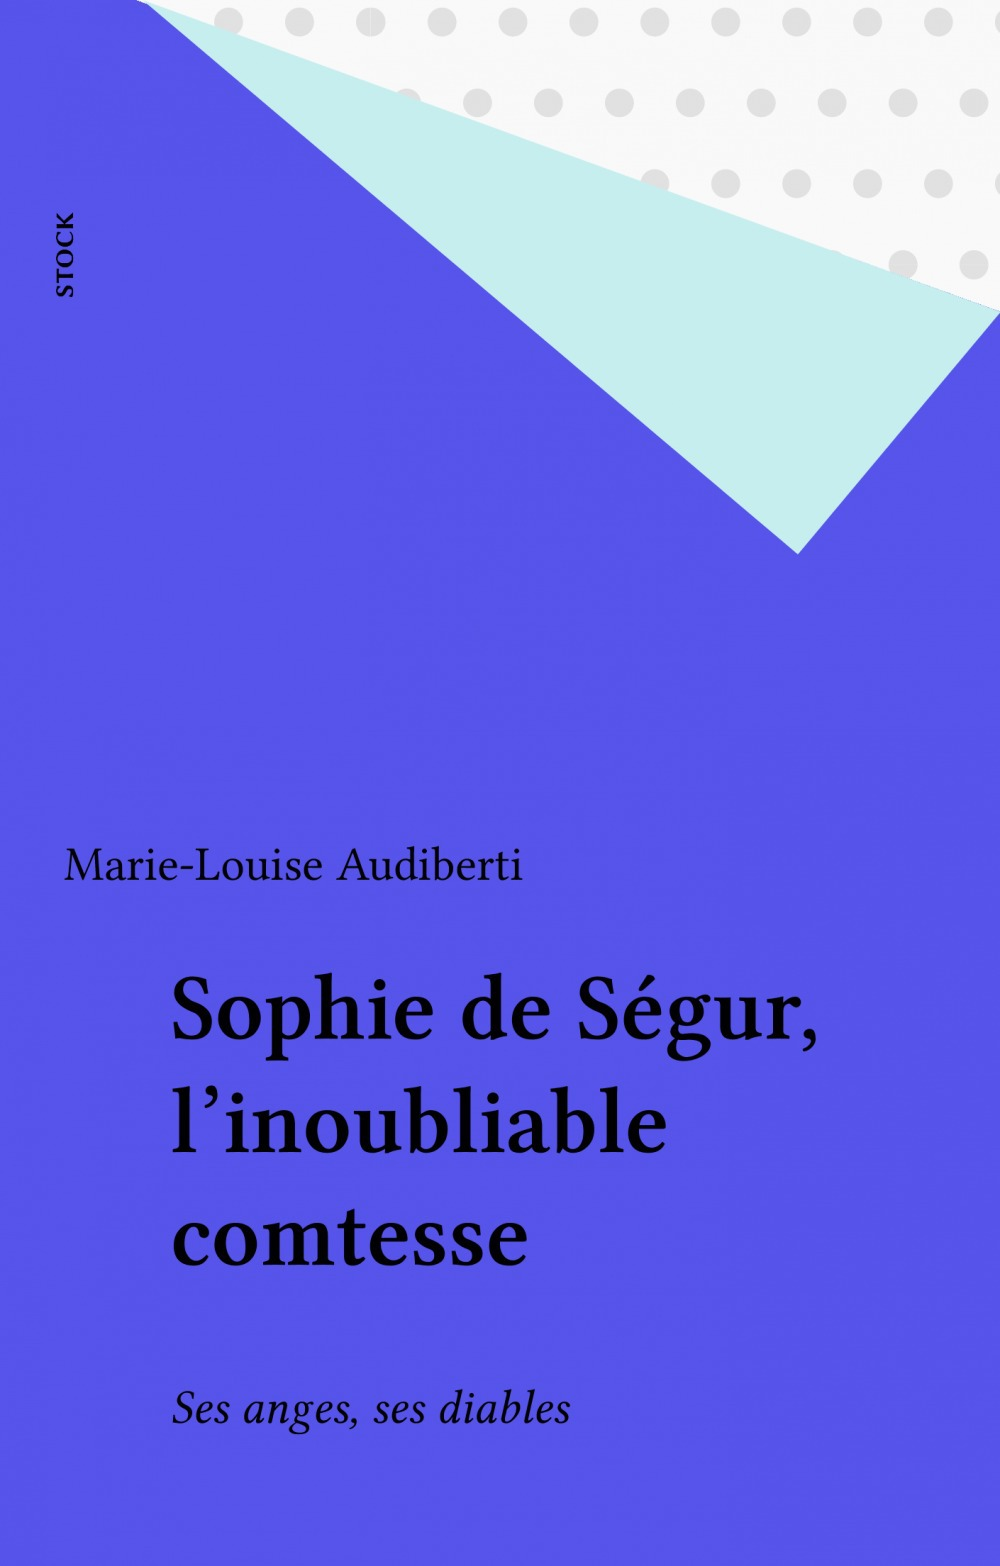 Sophie de segur nee rostopchine l'inoubliable comtesse